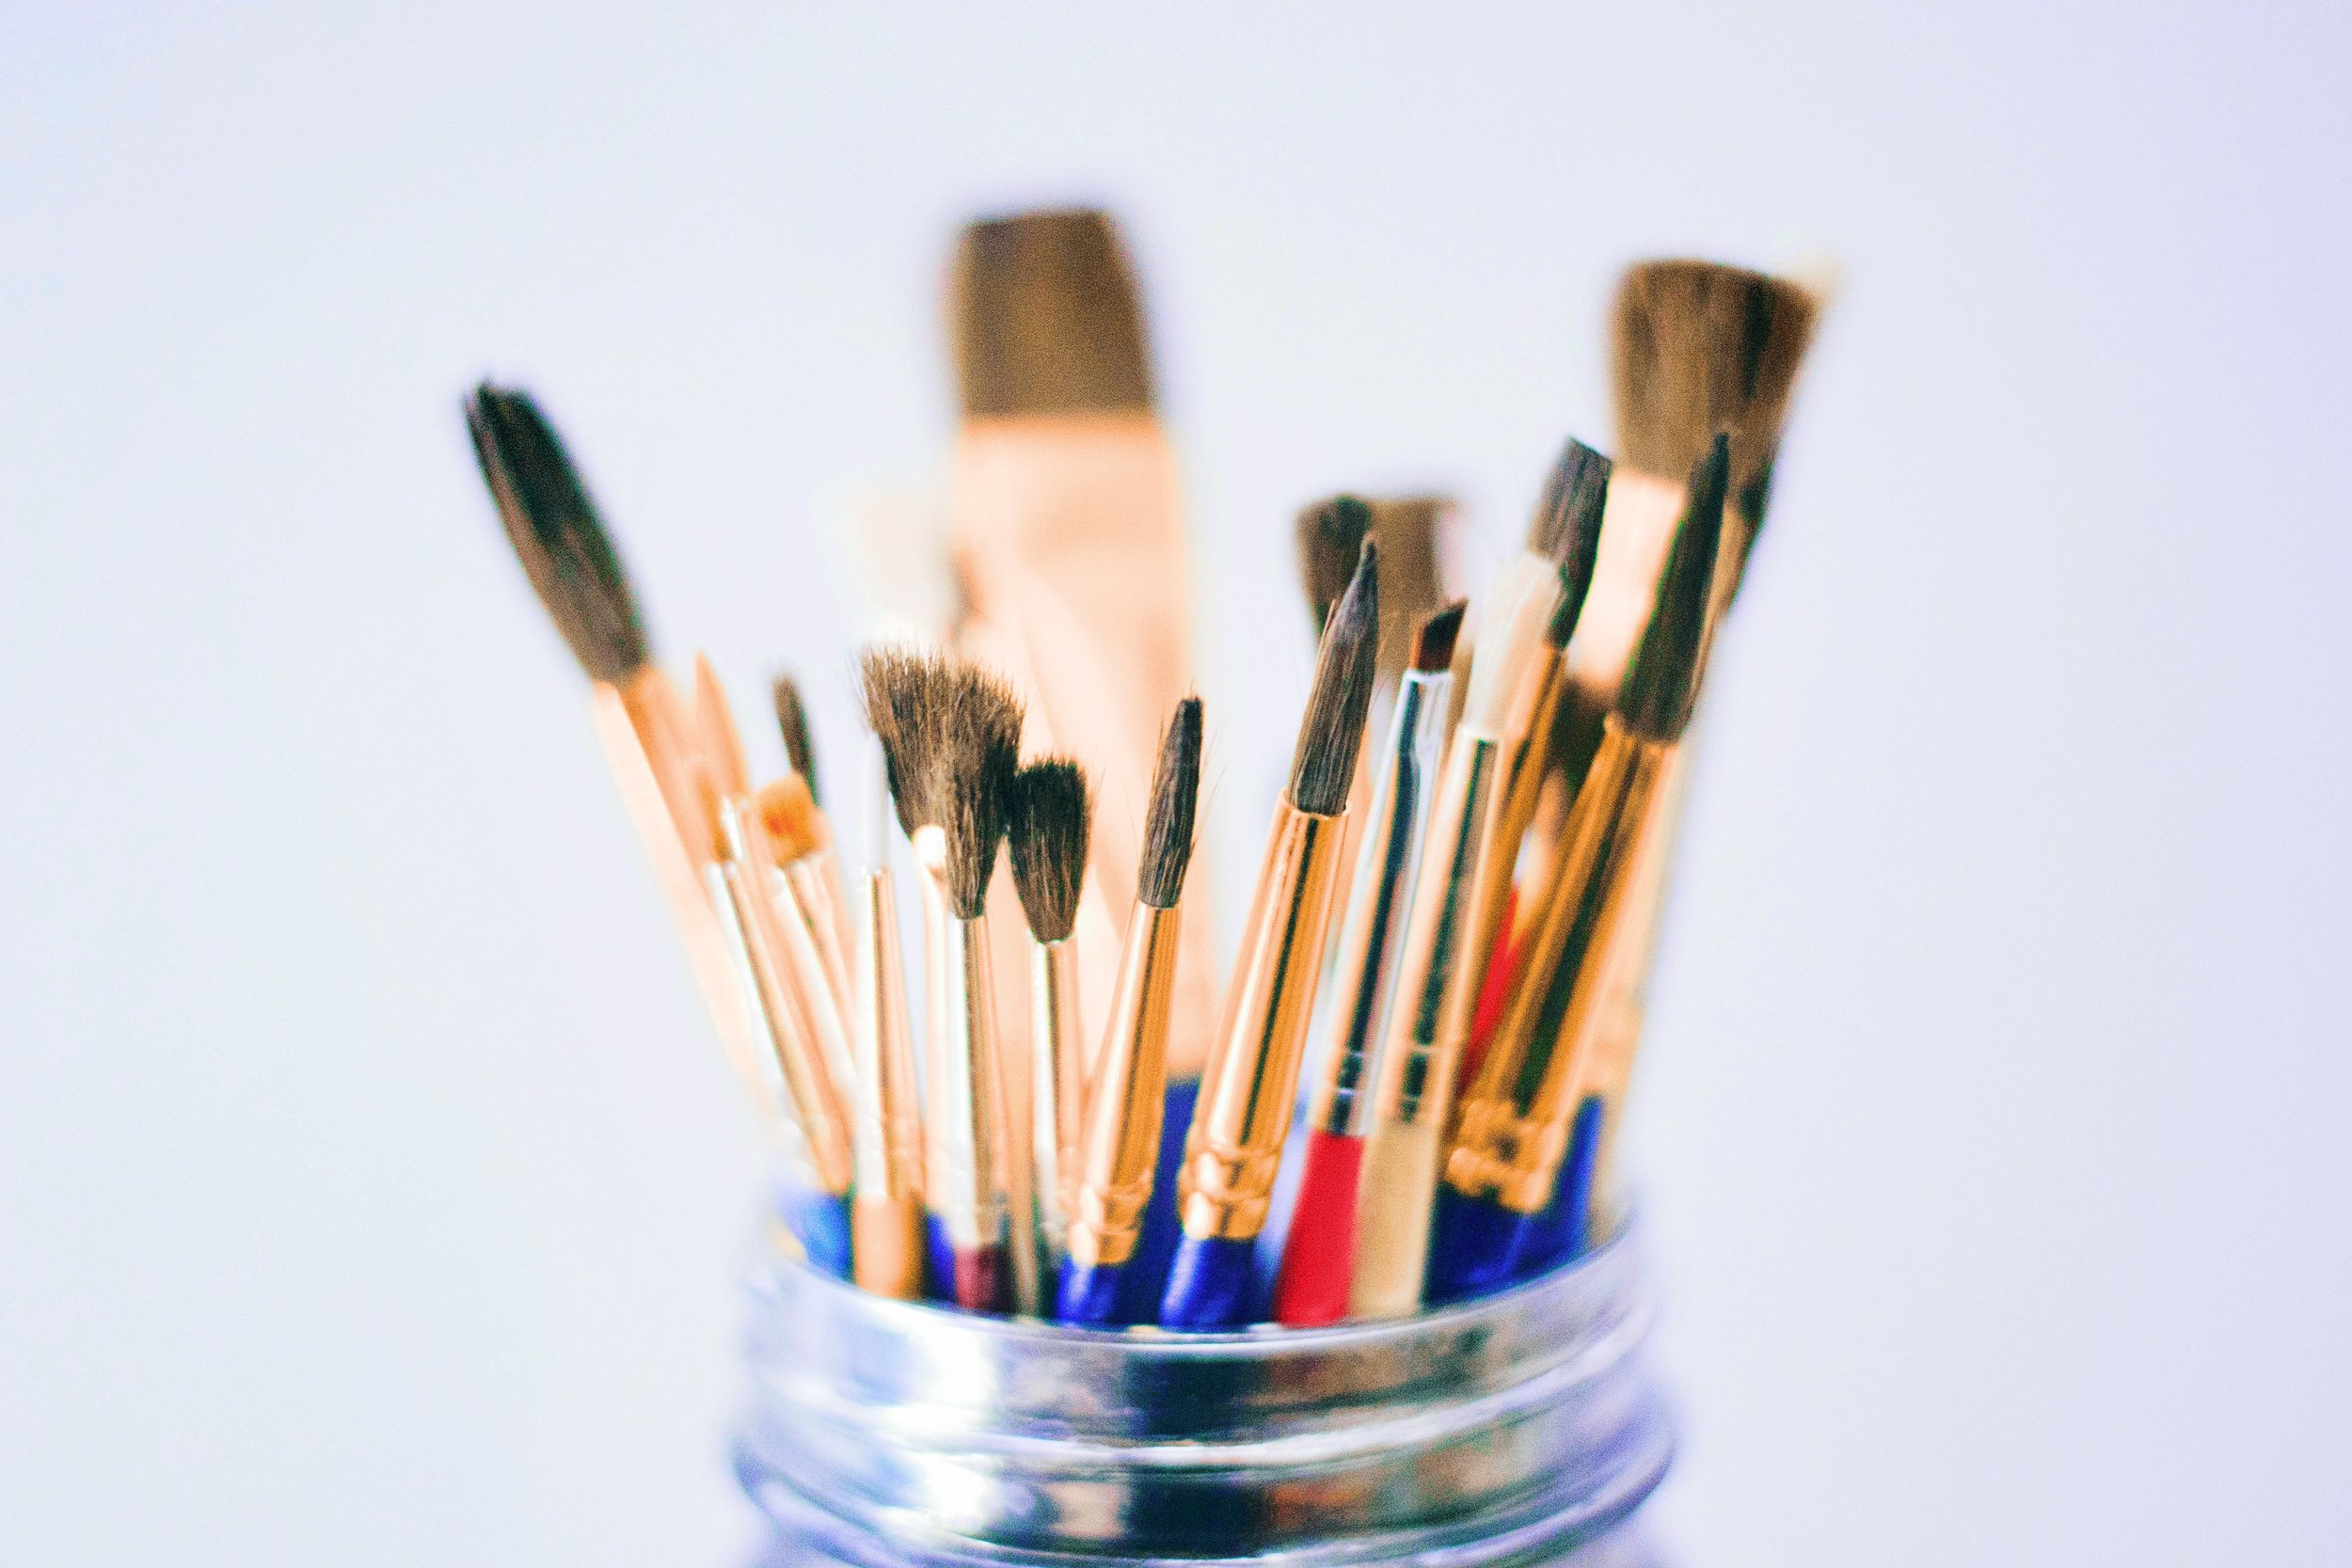 acrylic-art-arts-and-crafts-1084406.jpg